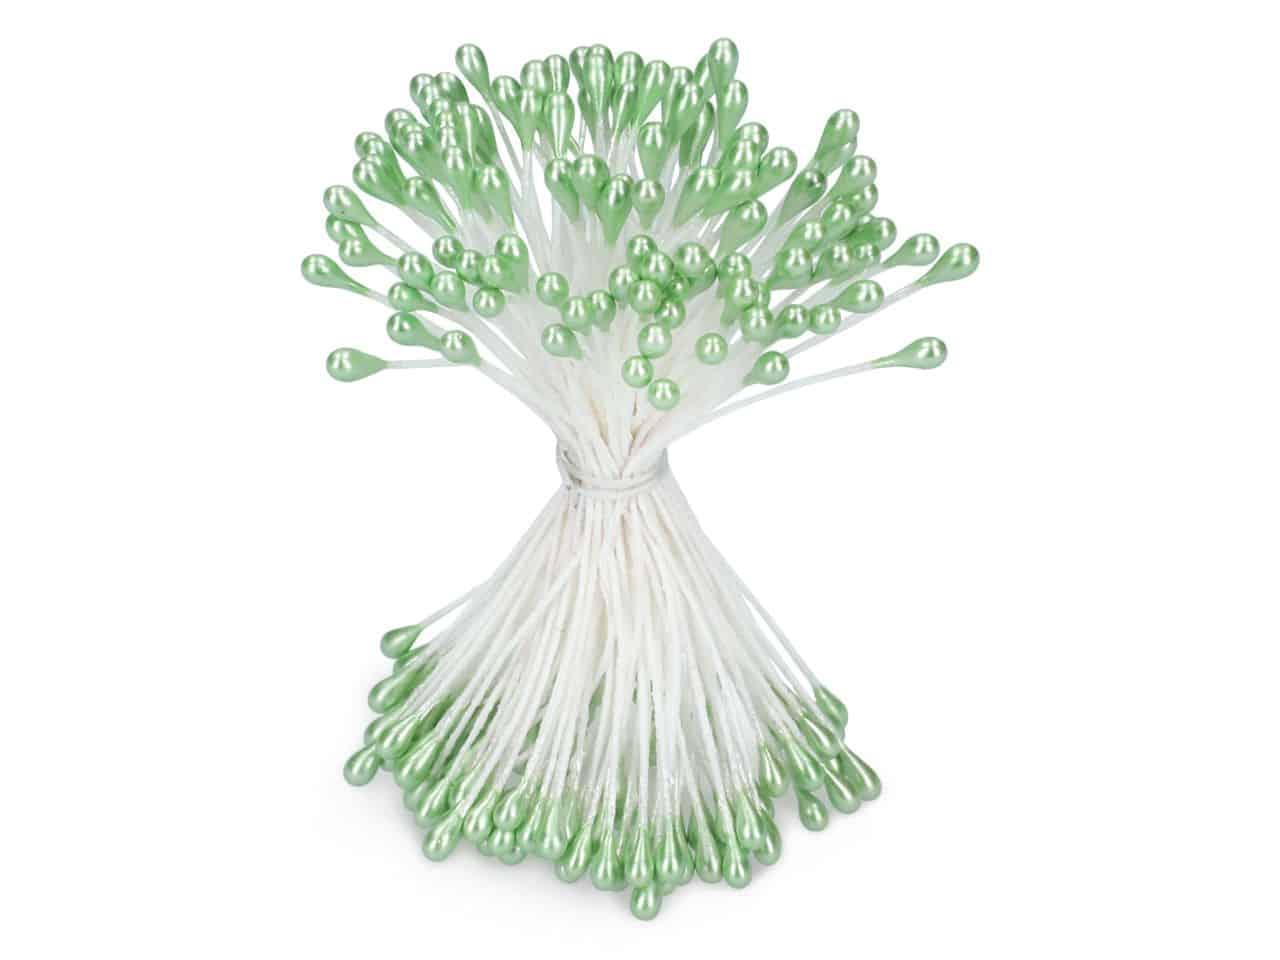 Staubblüten grün 120 Stück V01